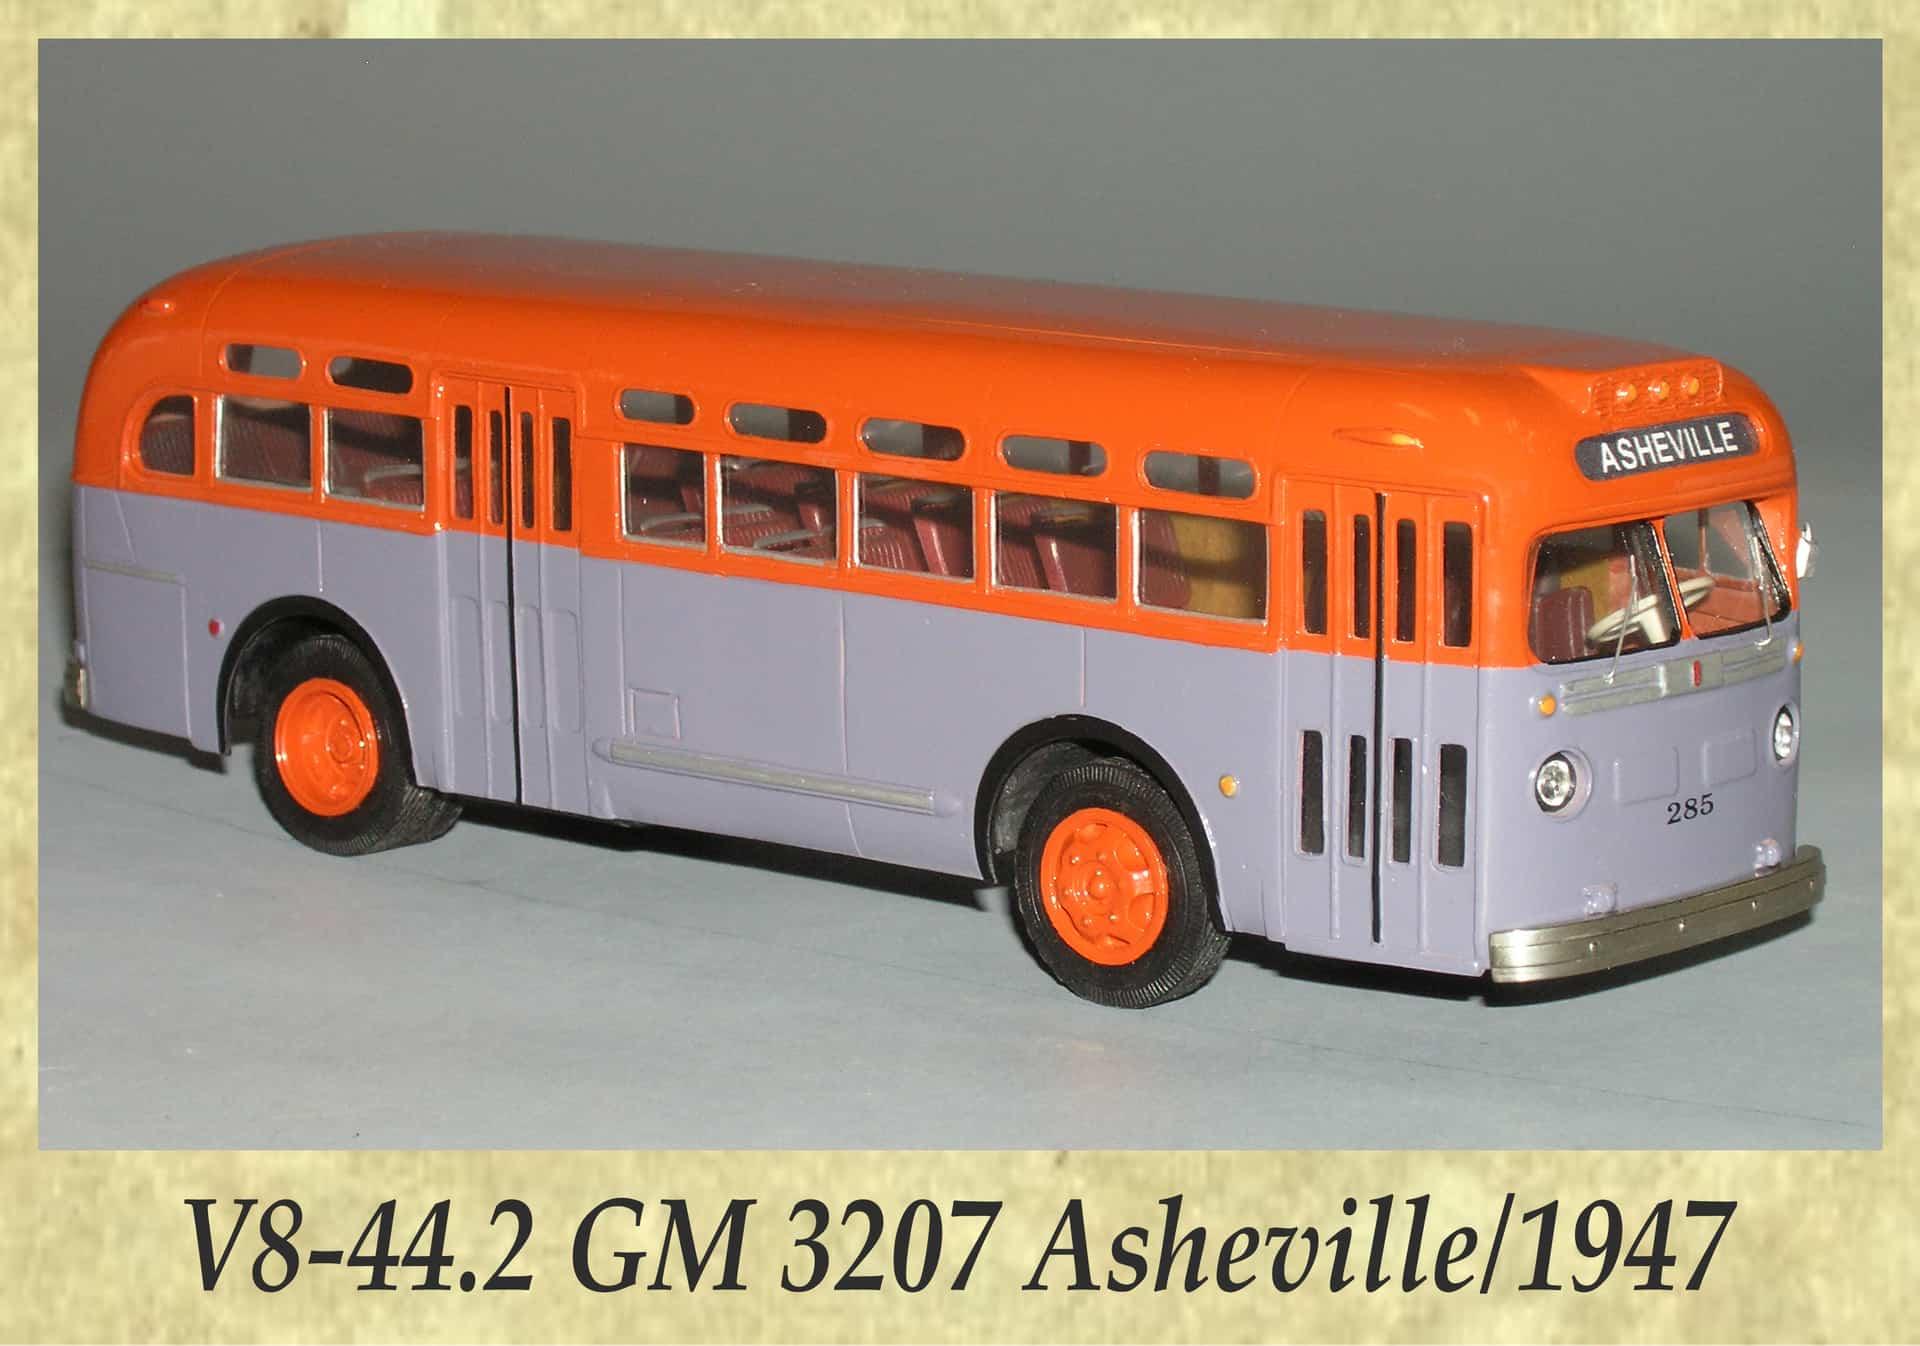 V8-44.2 GM 3207 Asheville 1947